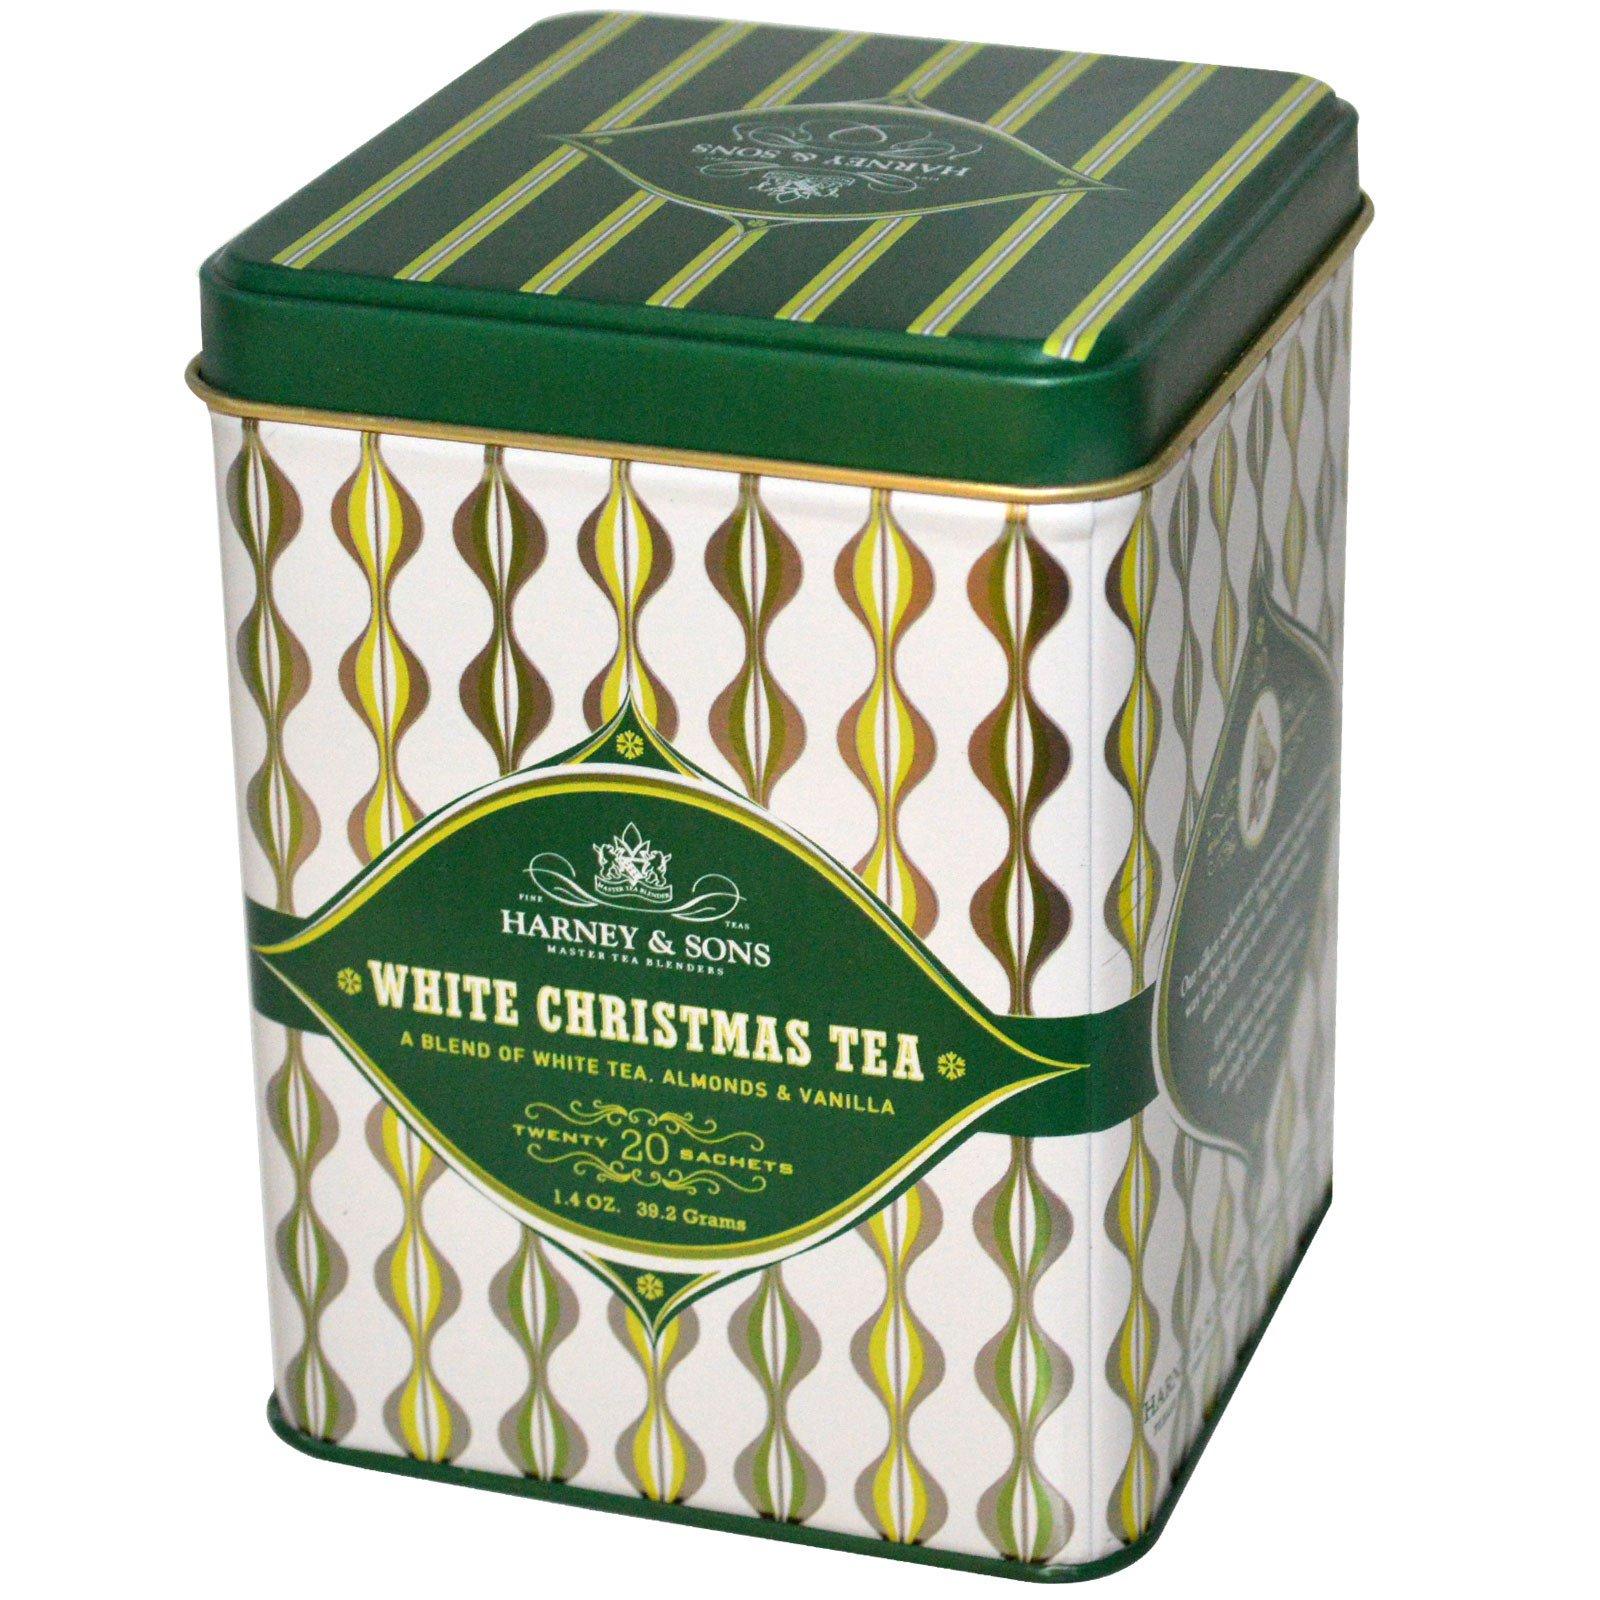 Harney & Sons, White Christmas Tea, 20 Sachets, 1.4 oz (39.2 g) - iHerb.com